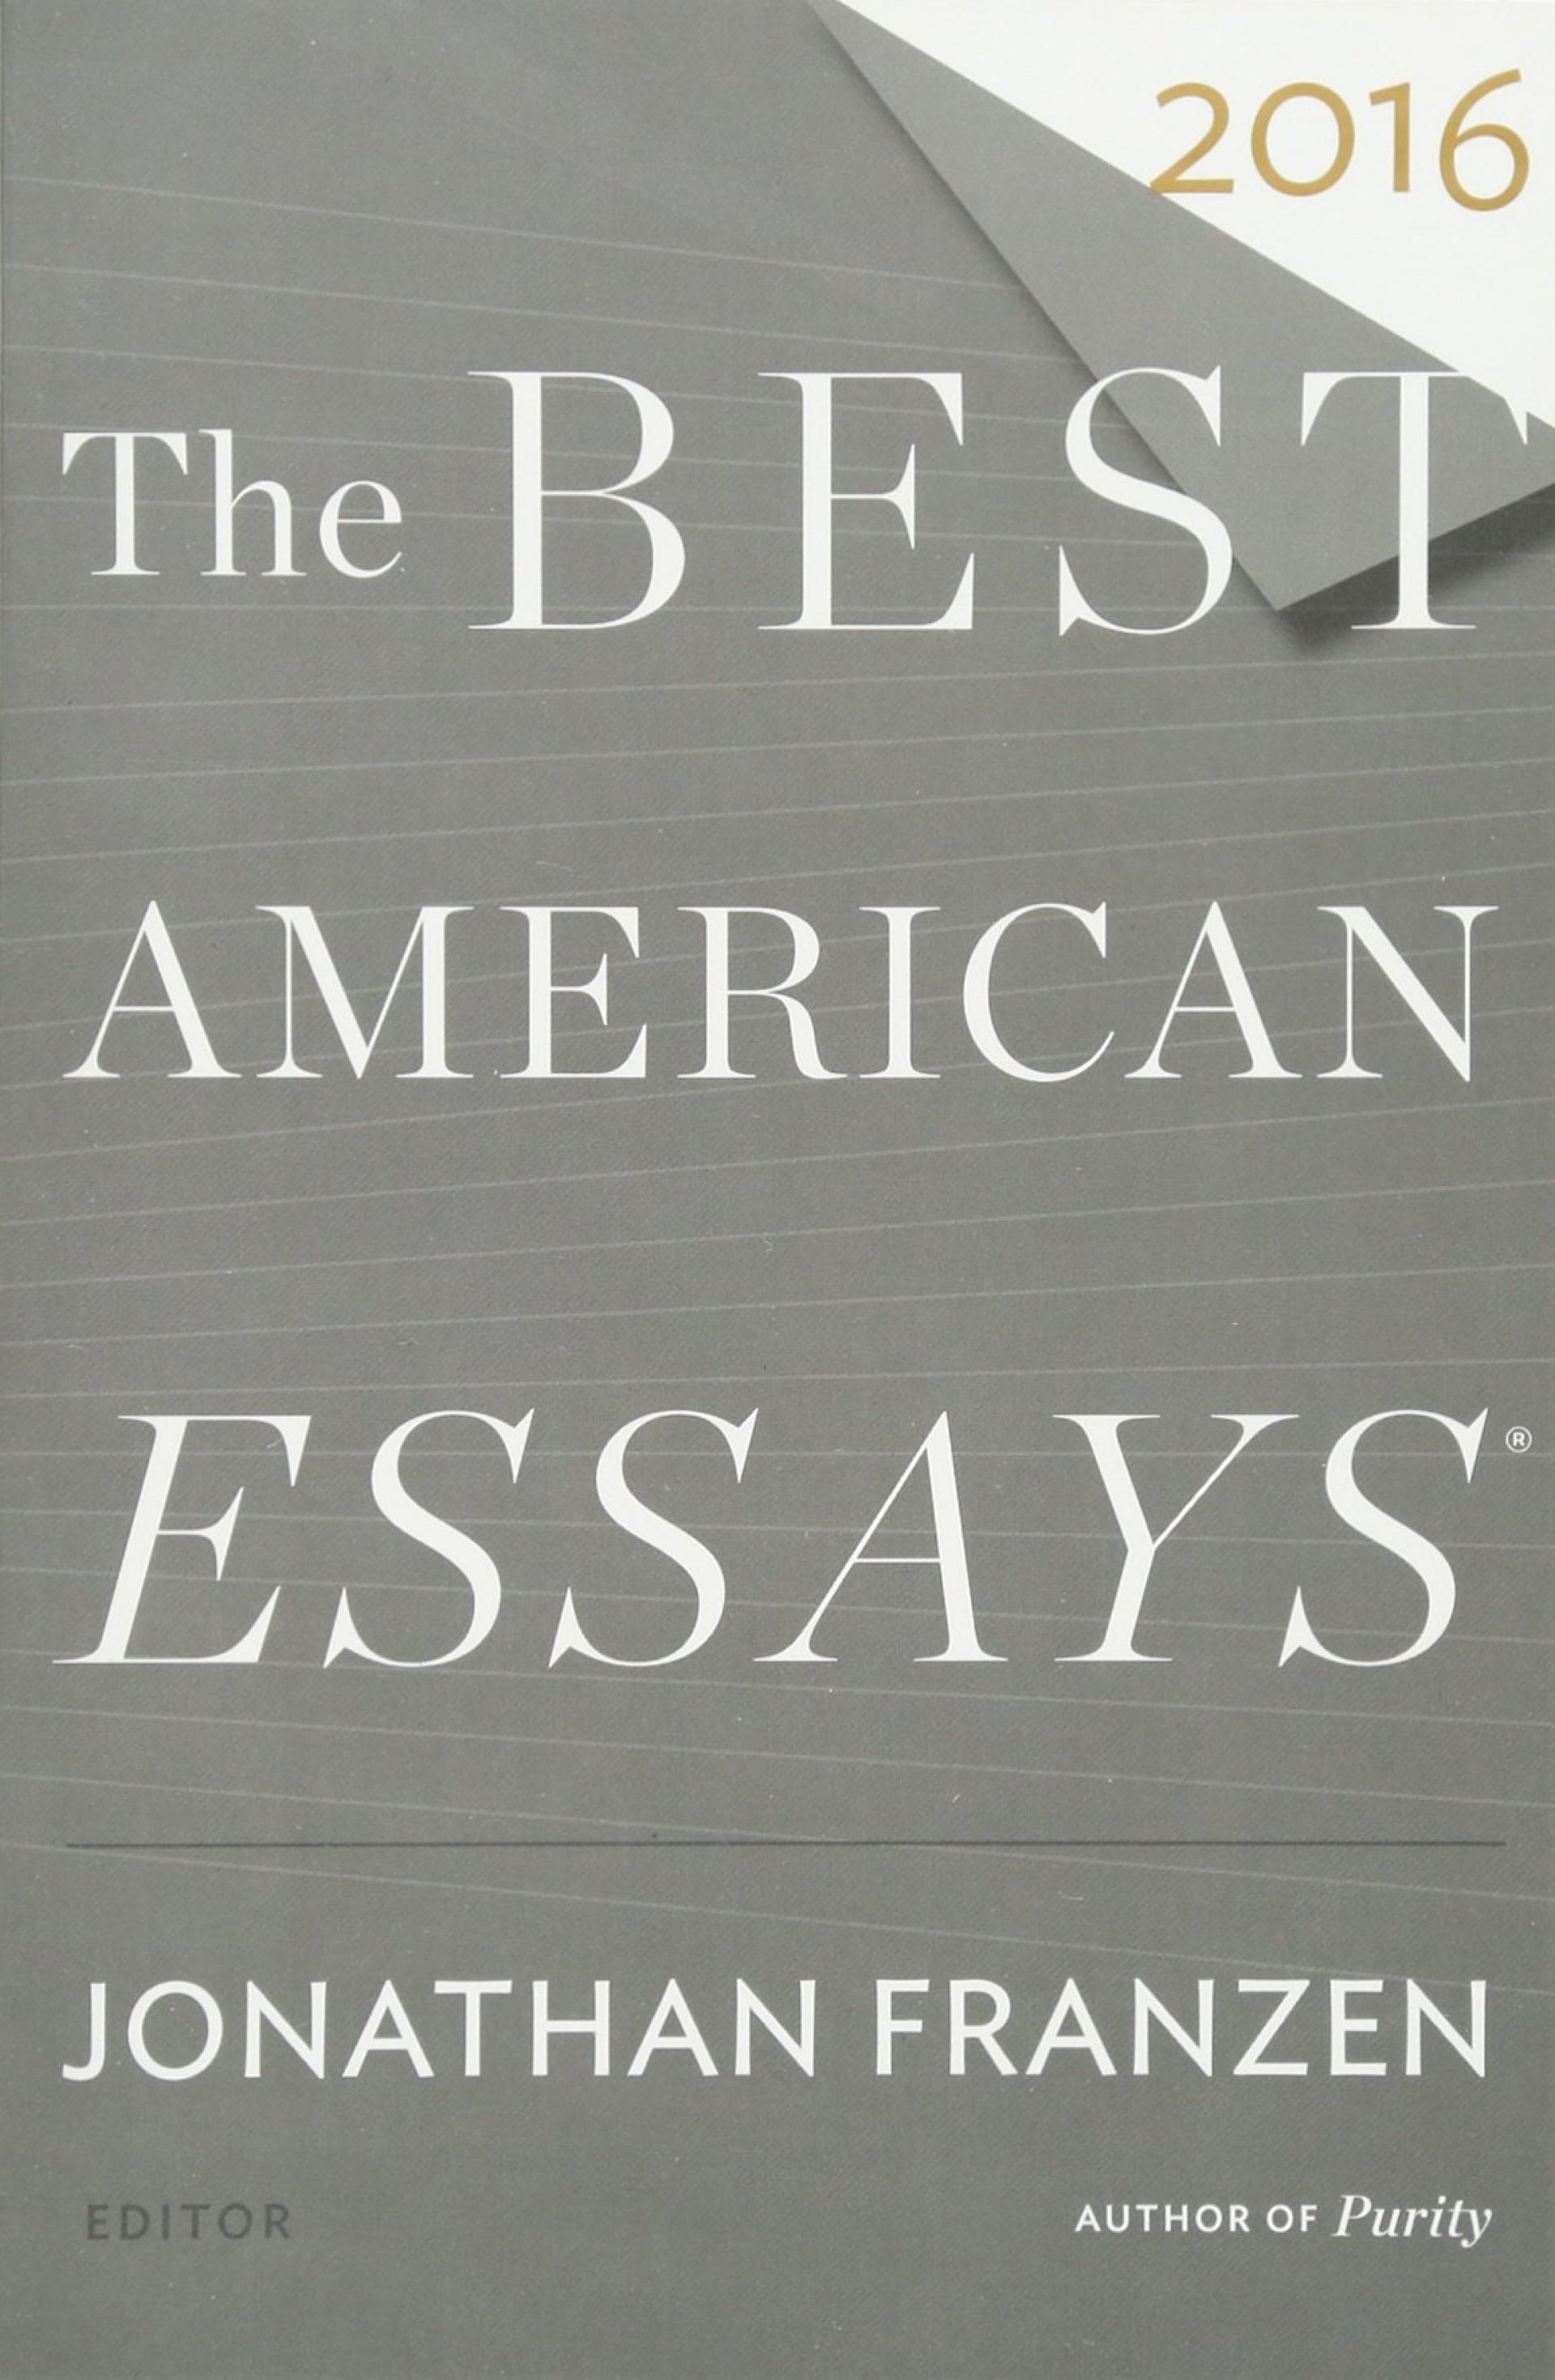 001 71a6bhsgsdl Essay Example Best Essays Breathtaking 2016 The American Audiobook Short Pdf 1920